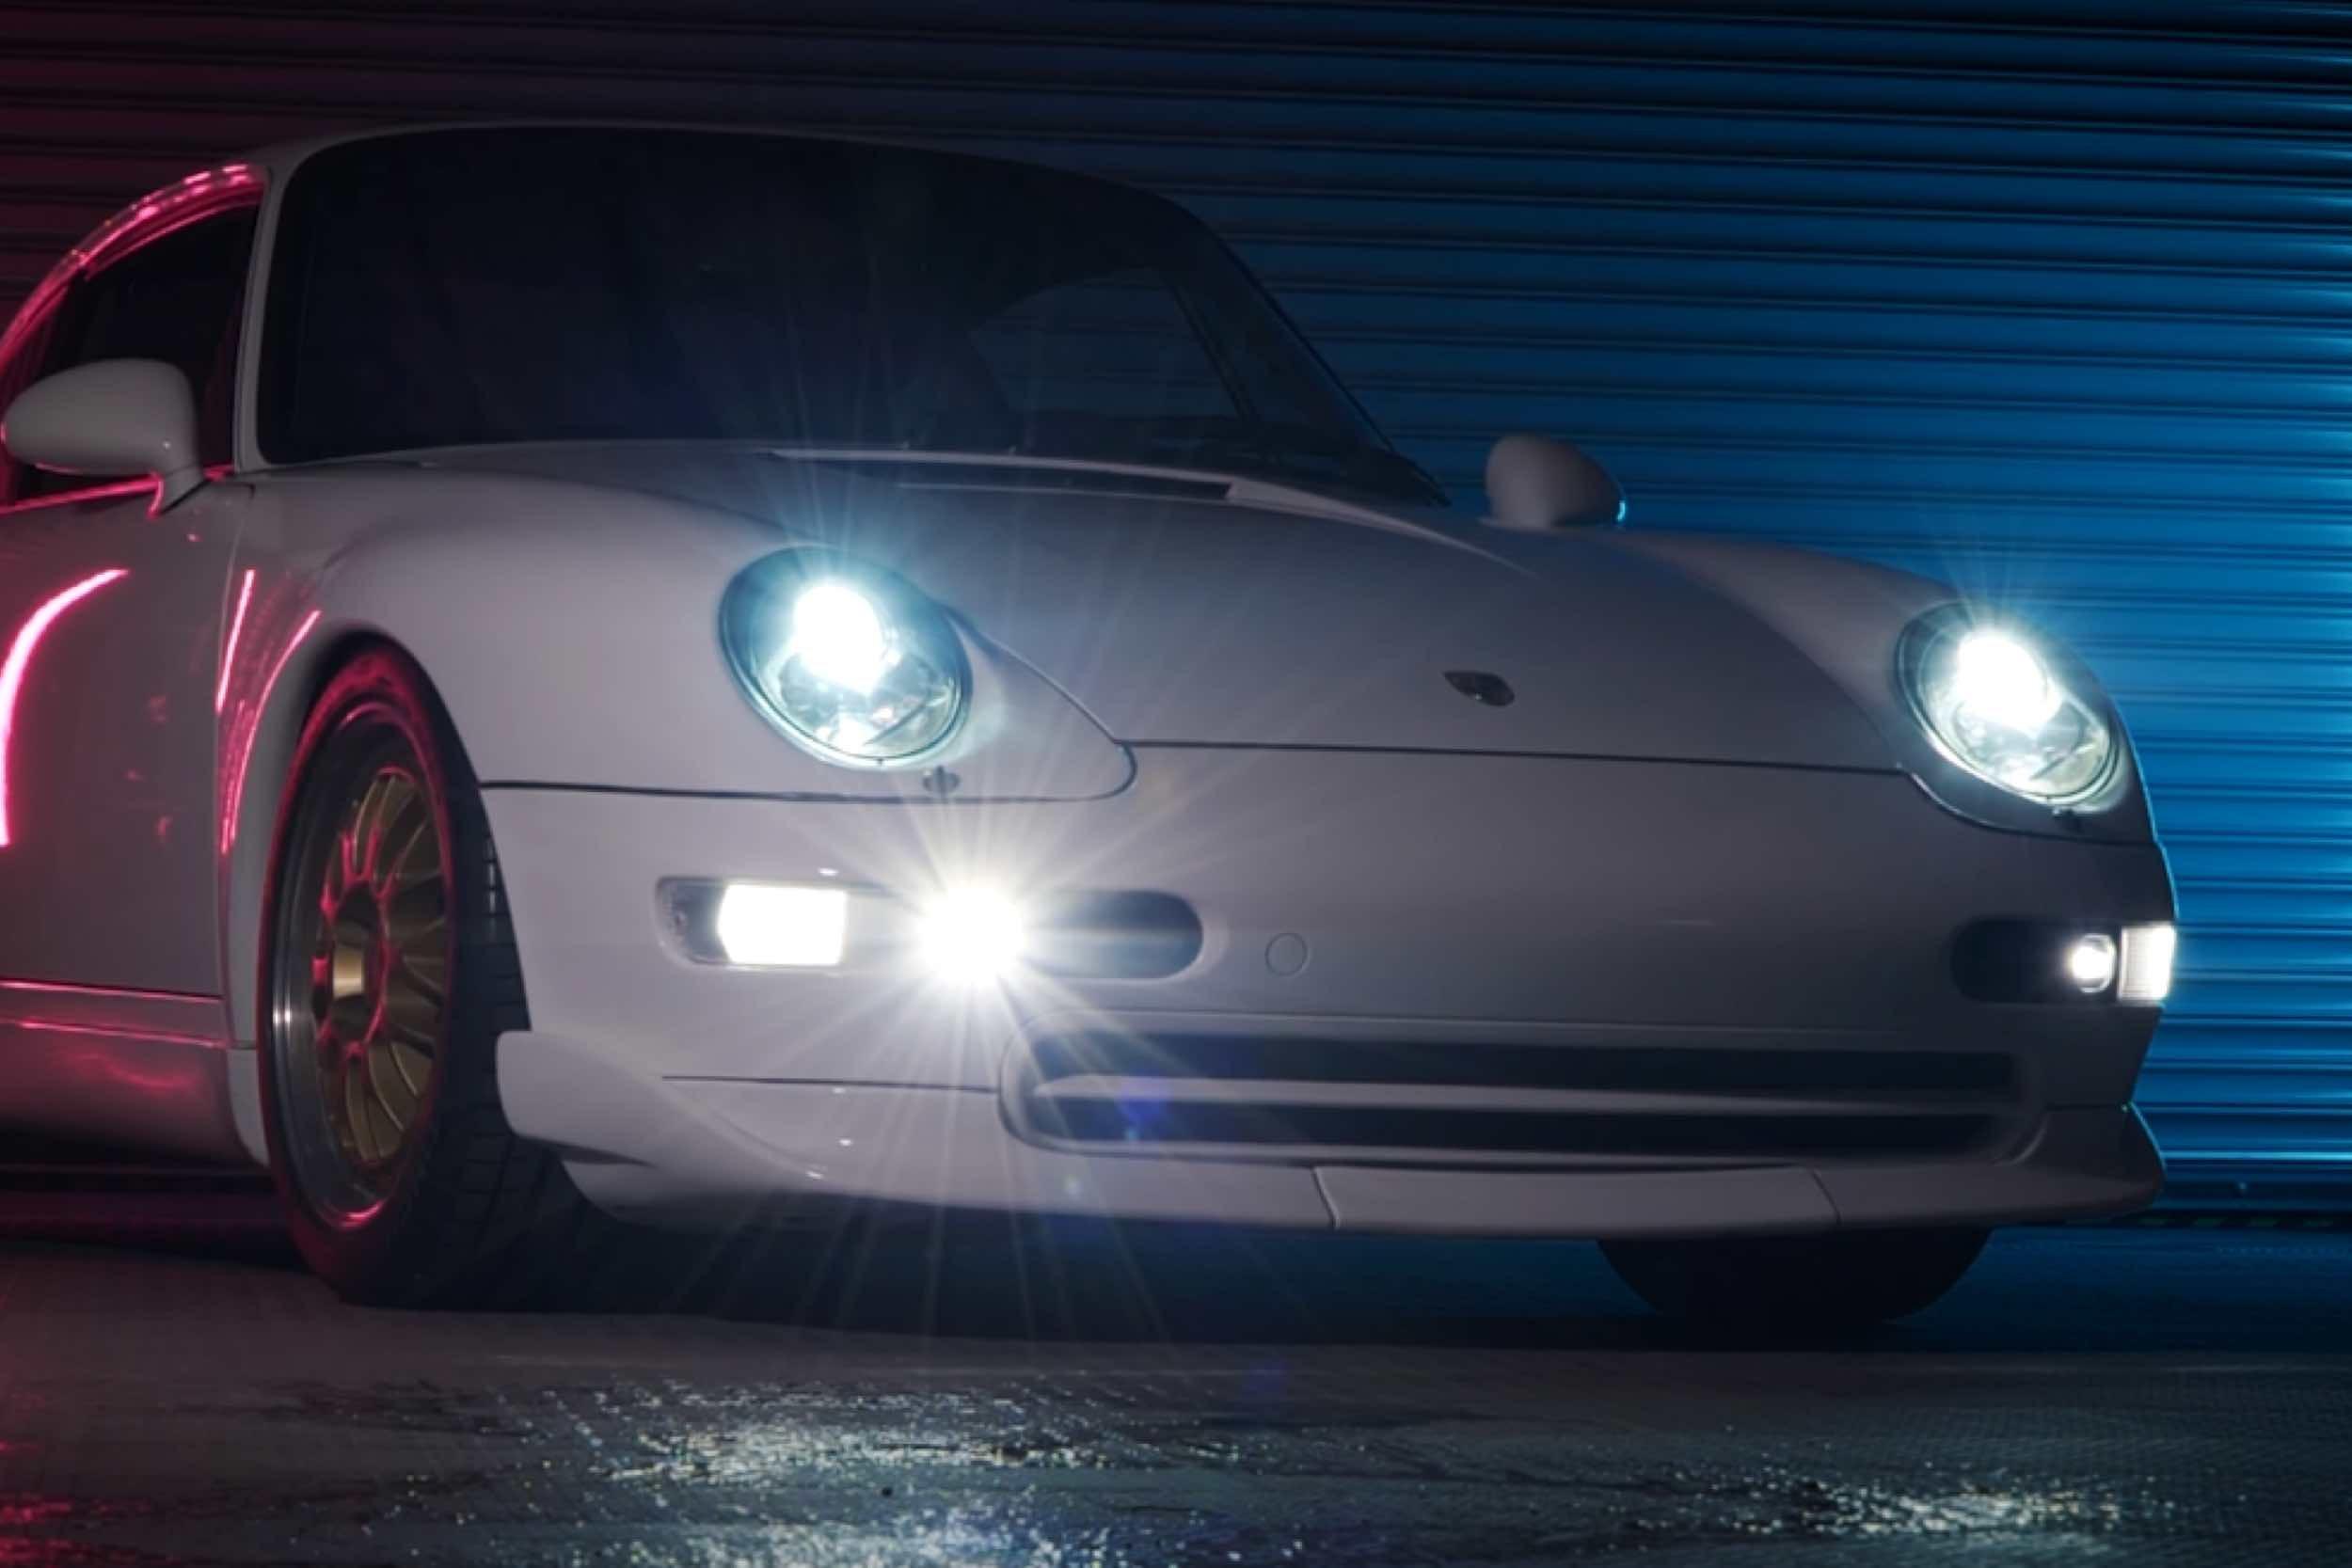 New Superduty, Tacoma, Tundra and Porsche LED Lights from Morimoto